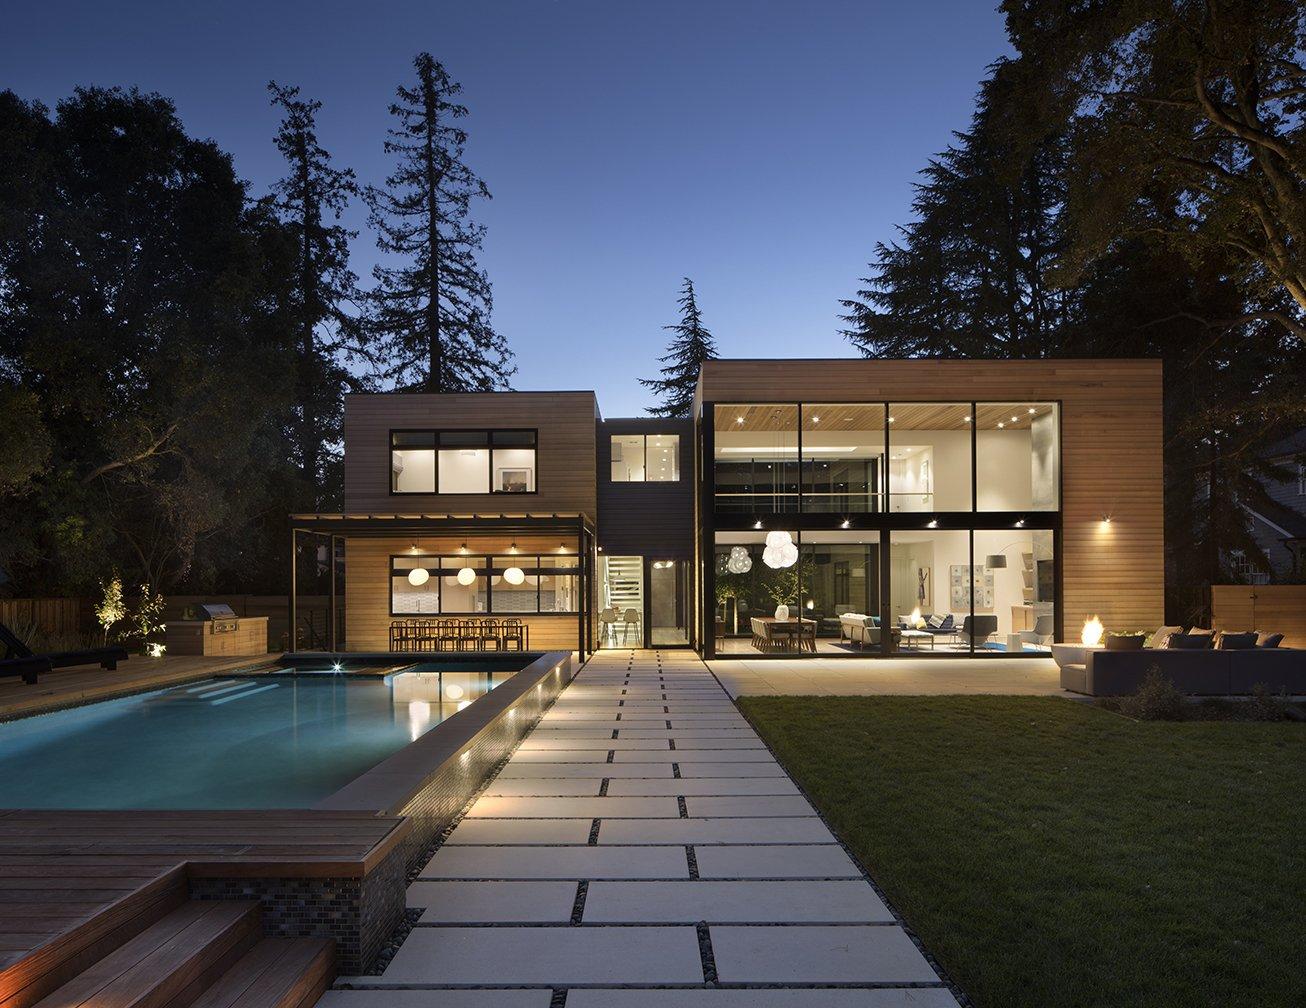 Courtyard House pool